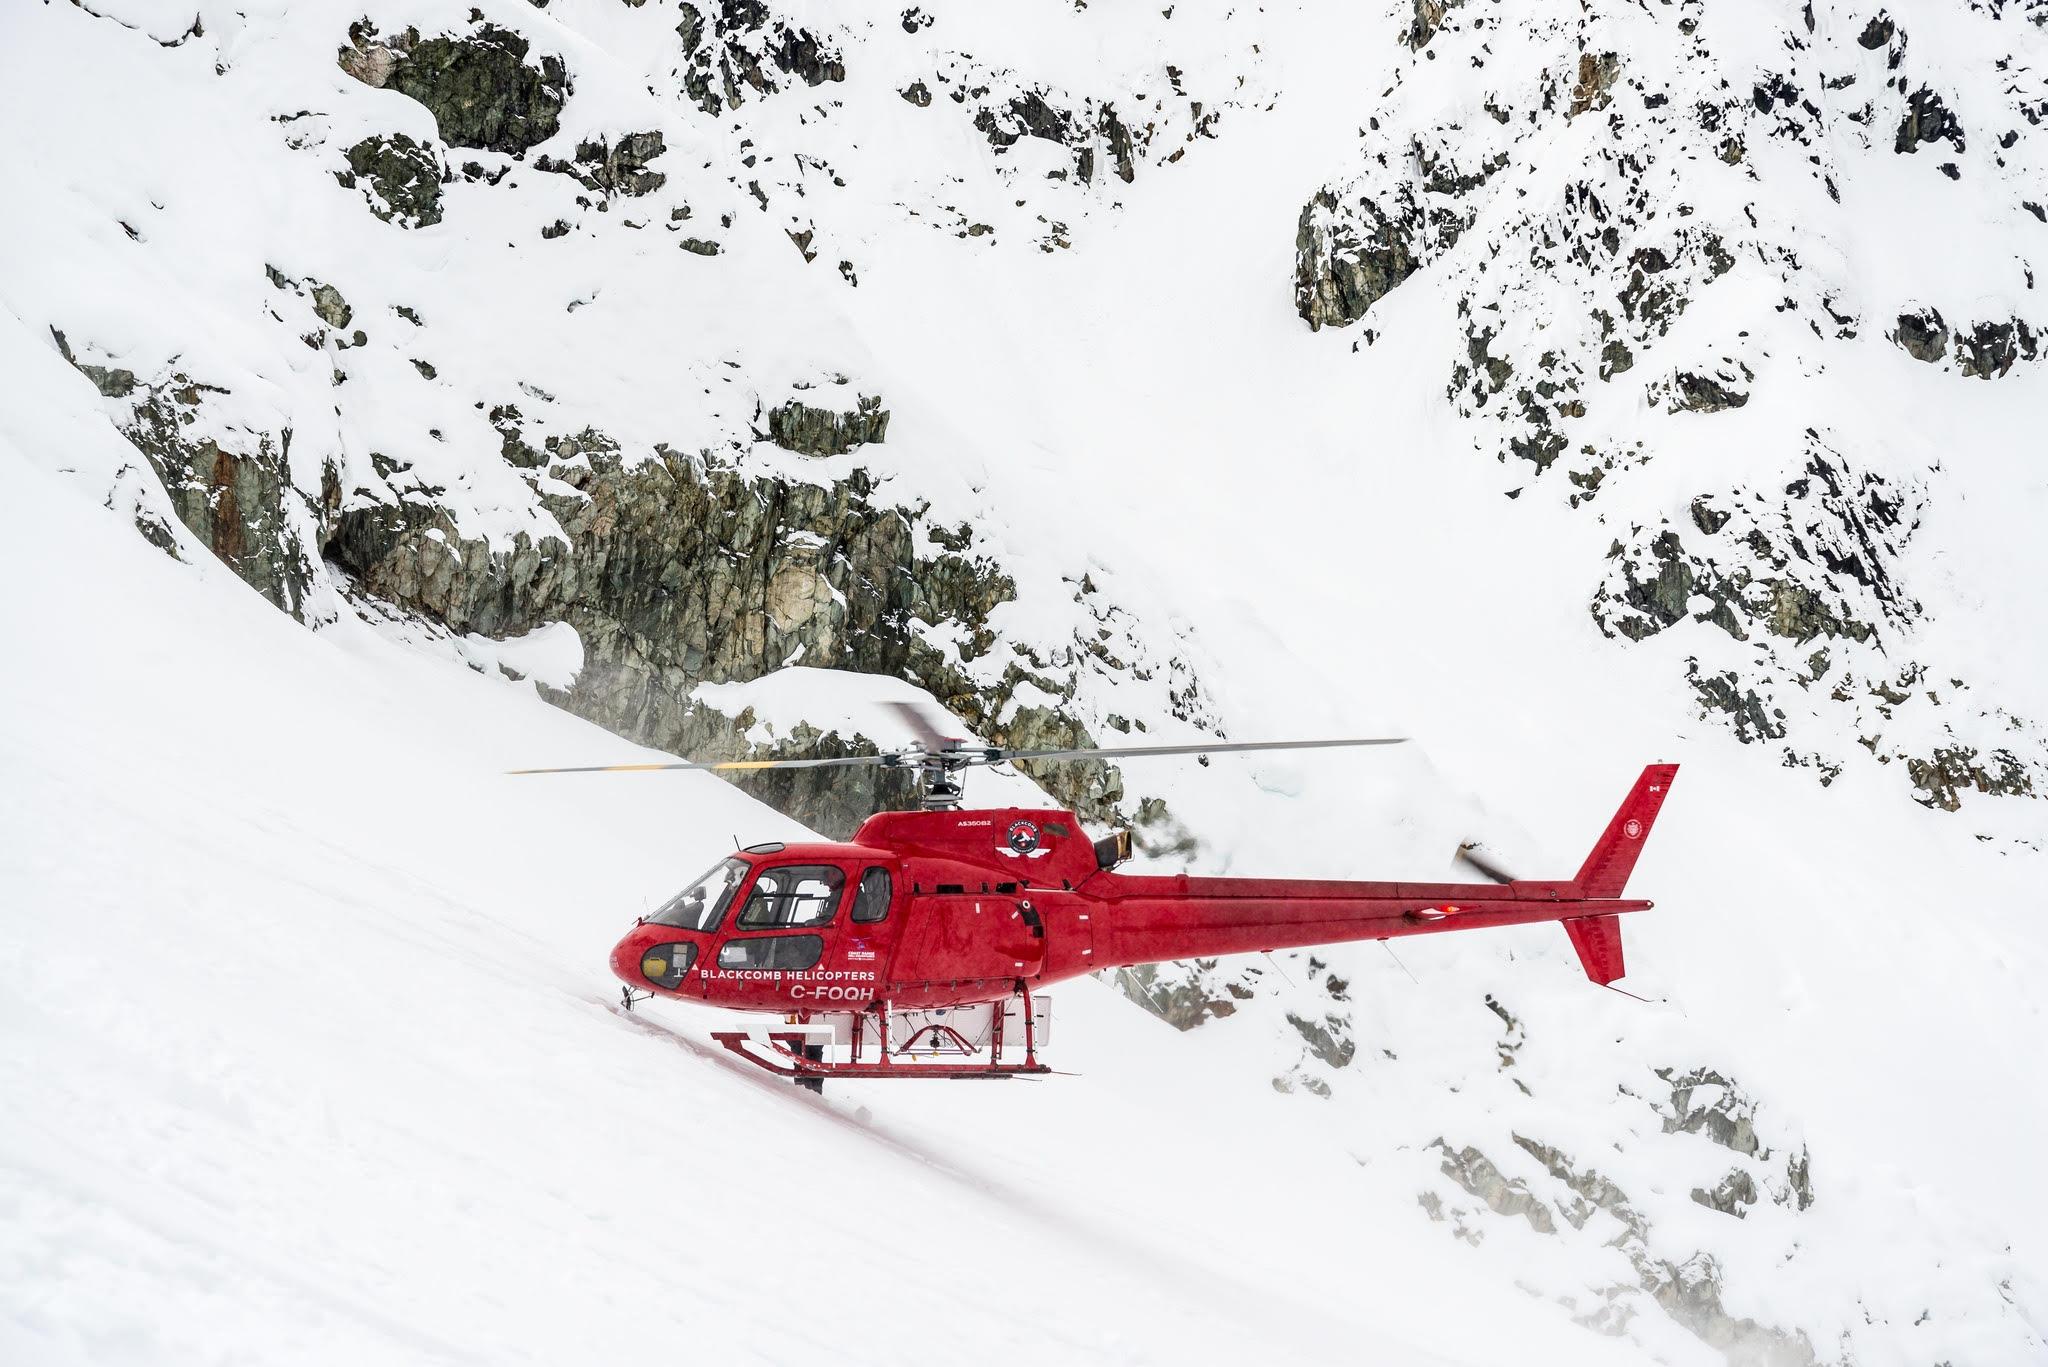 Mountain rescue arrive